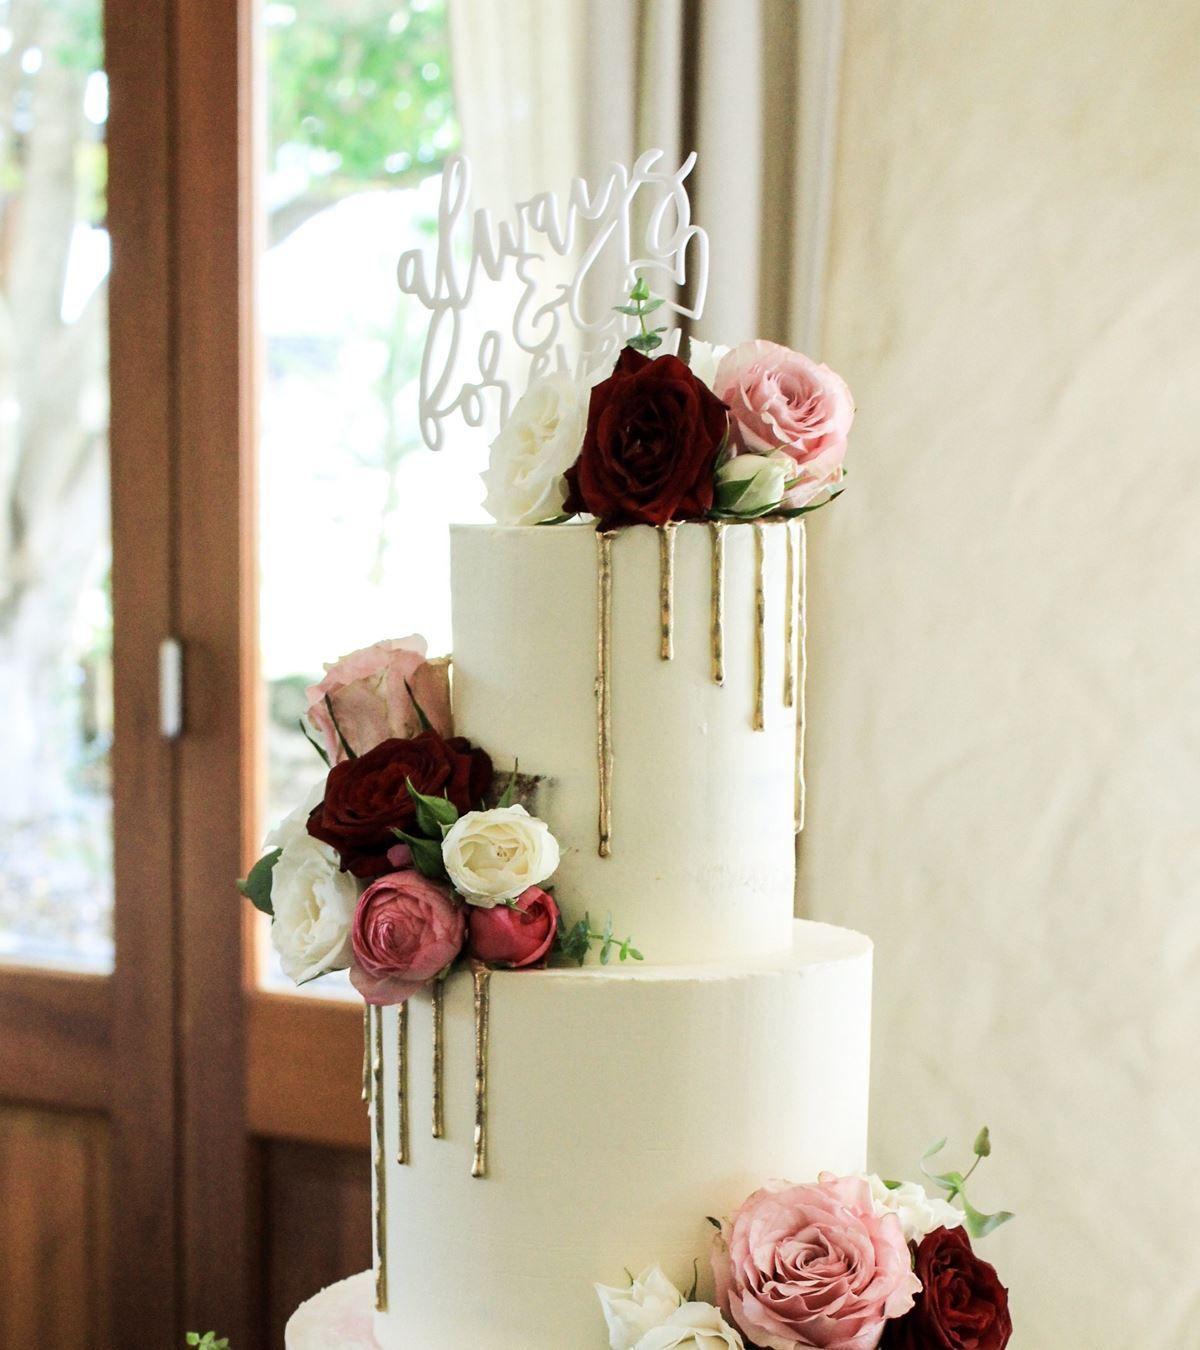 Bridal select cakes wedding cakes perth easy weddings